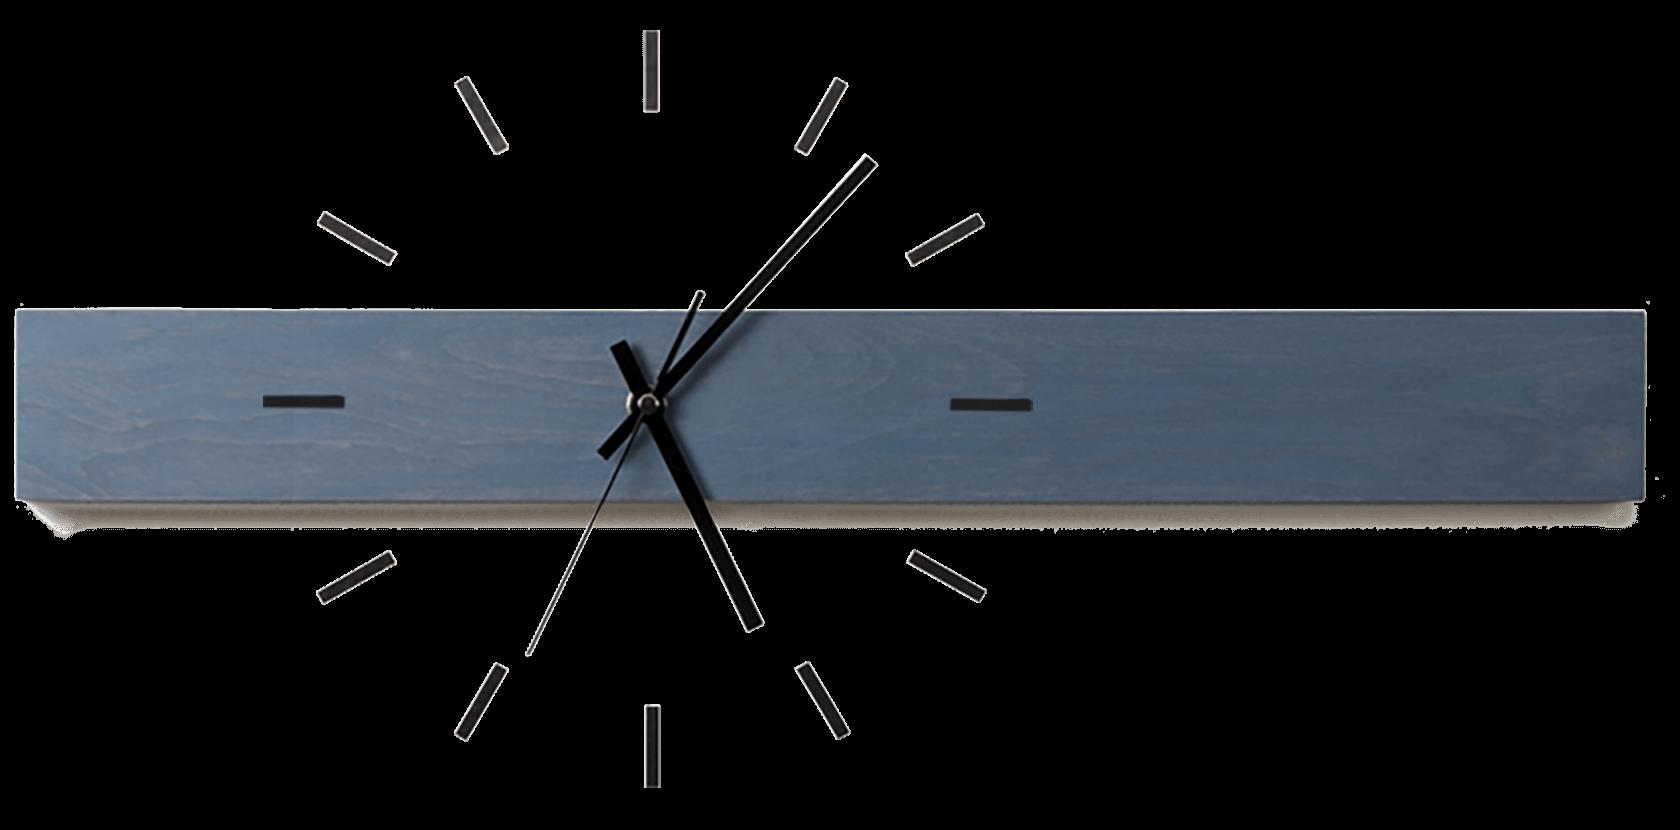 Design wanduhren aus holz mit zifferblatt als wandtattoo - Design wanduhr ...